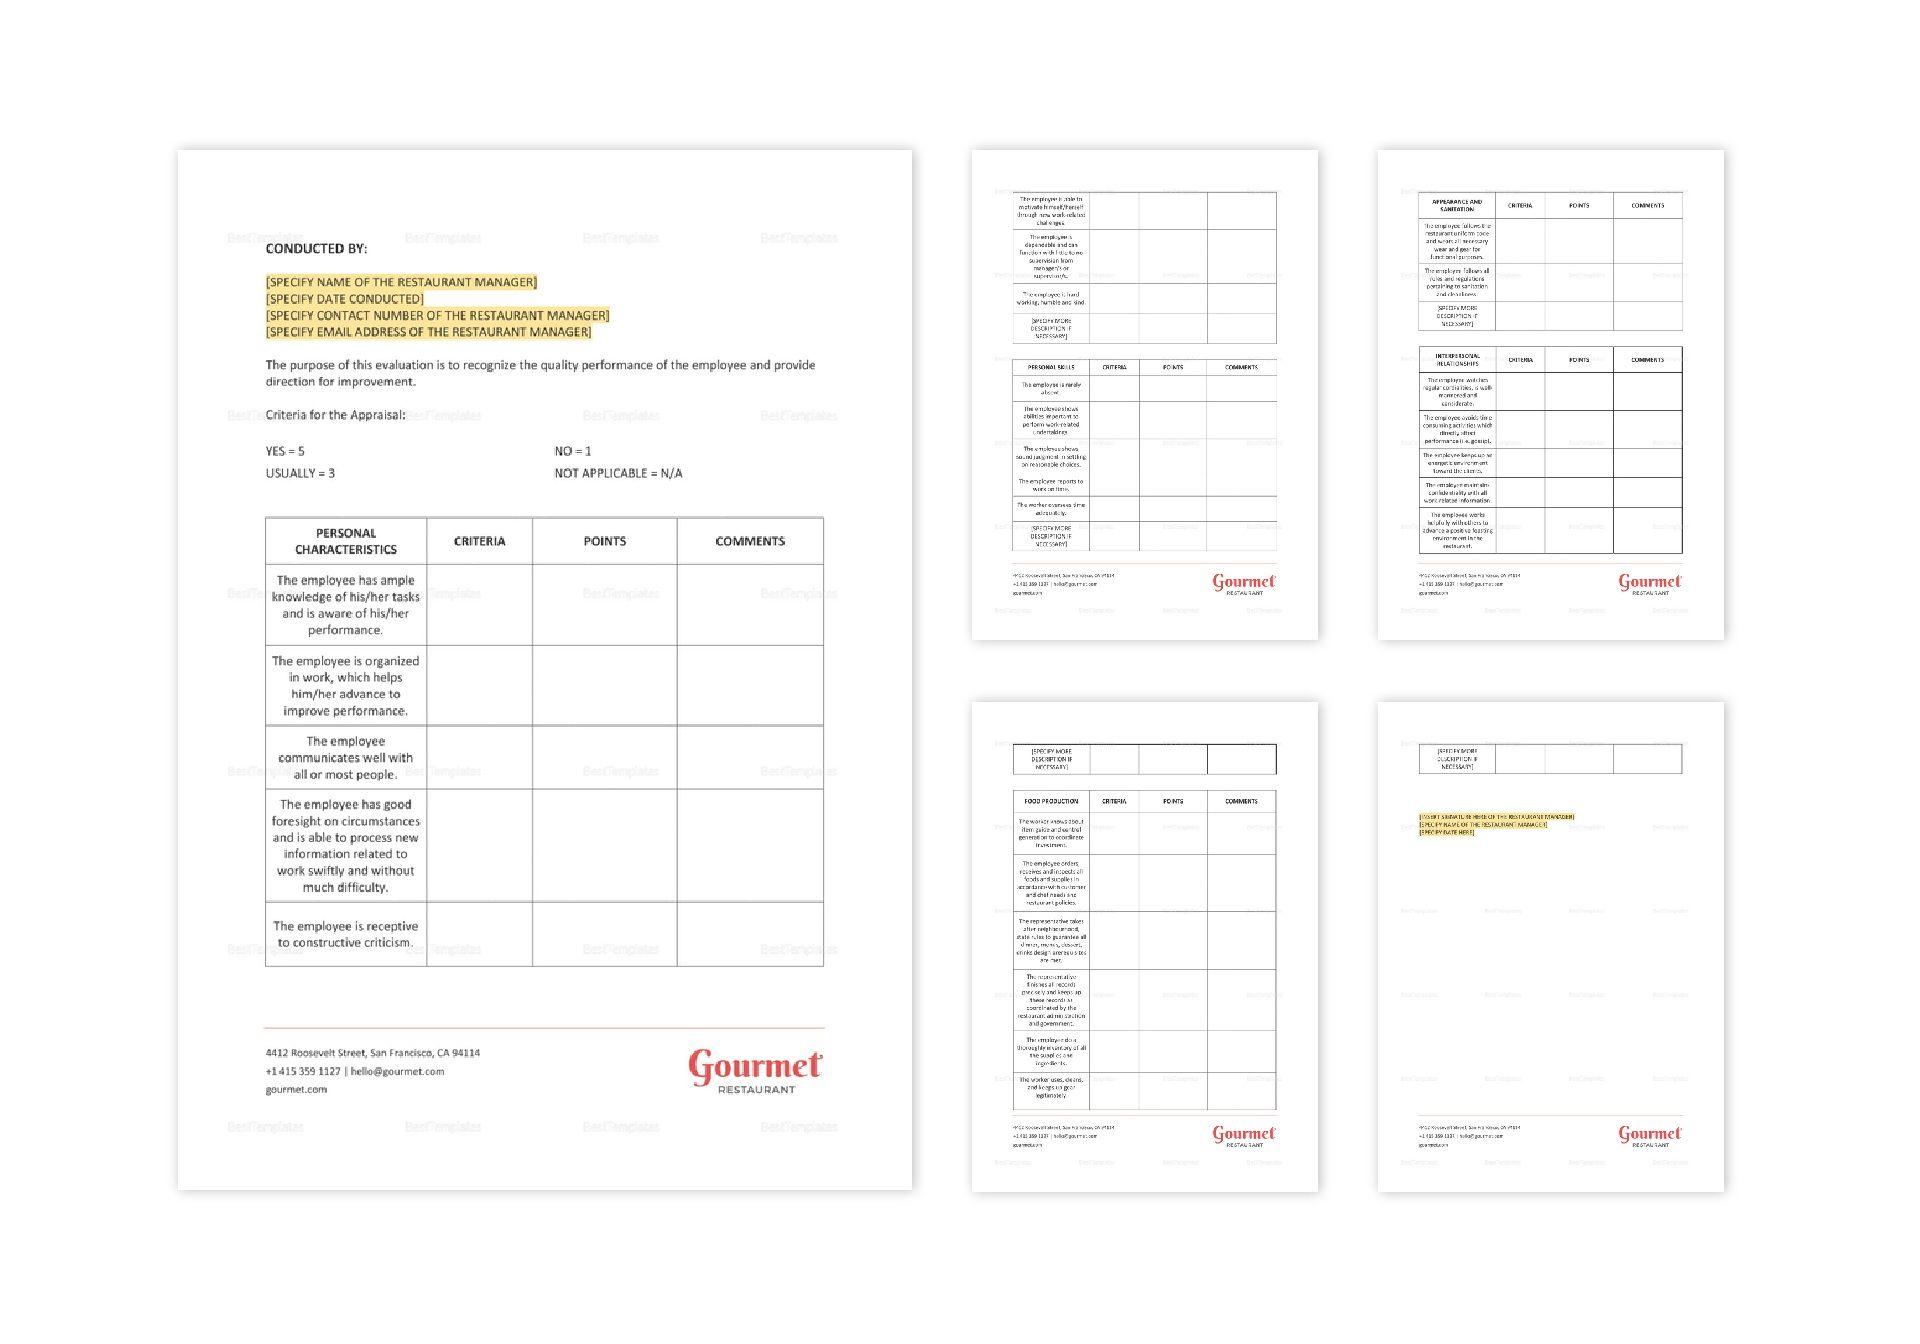 Restaurant Employee Appraisal Form Template in Word, Apple